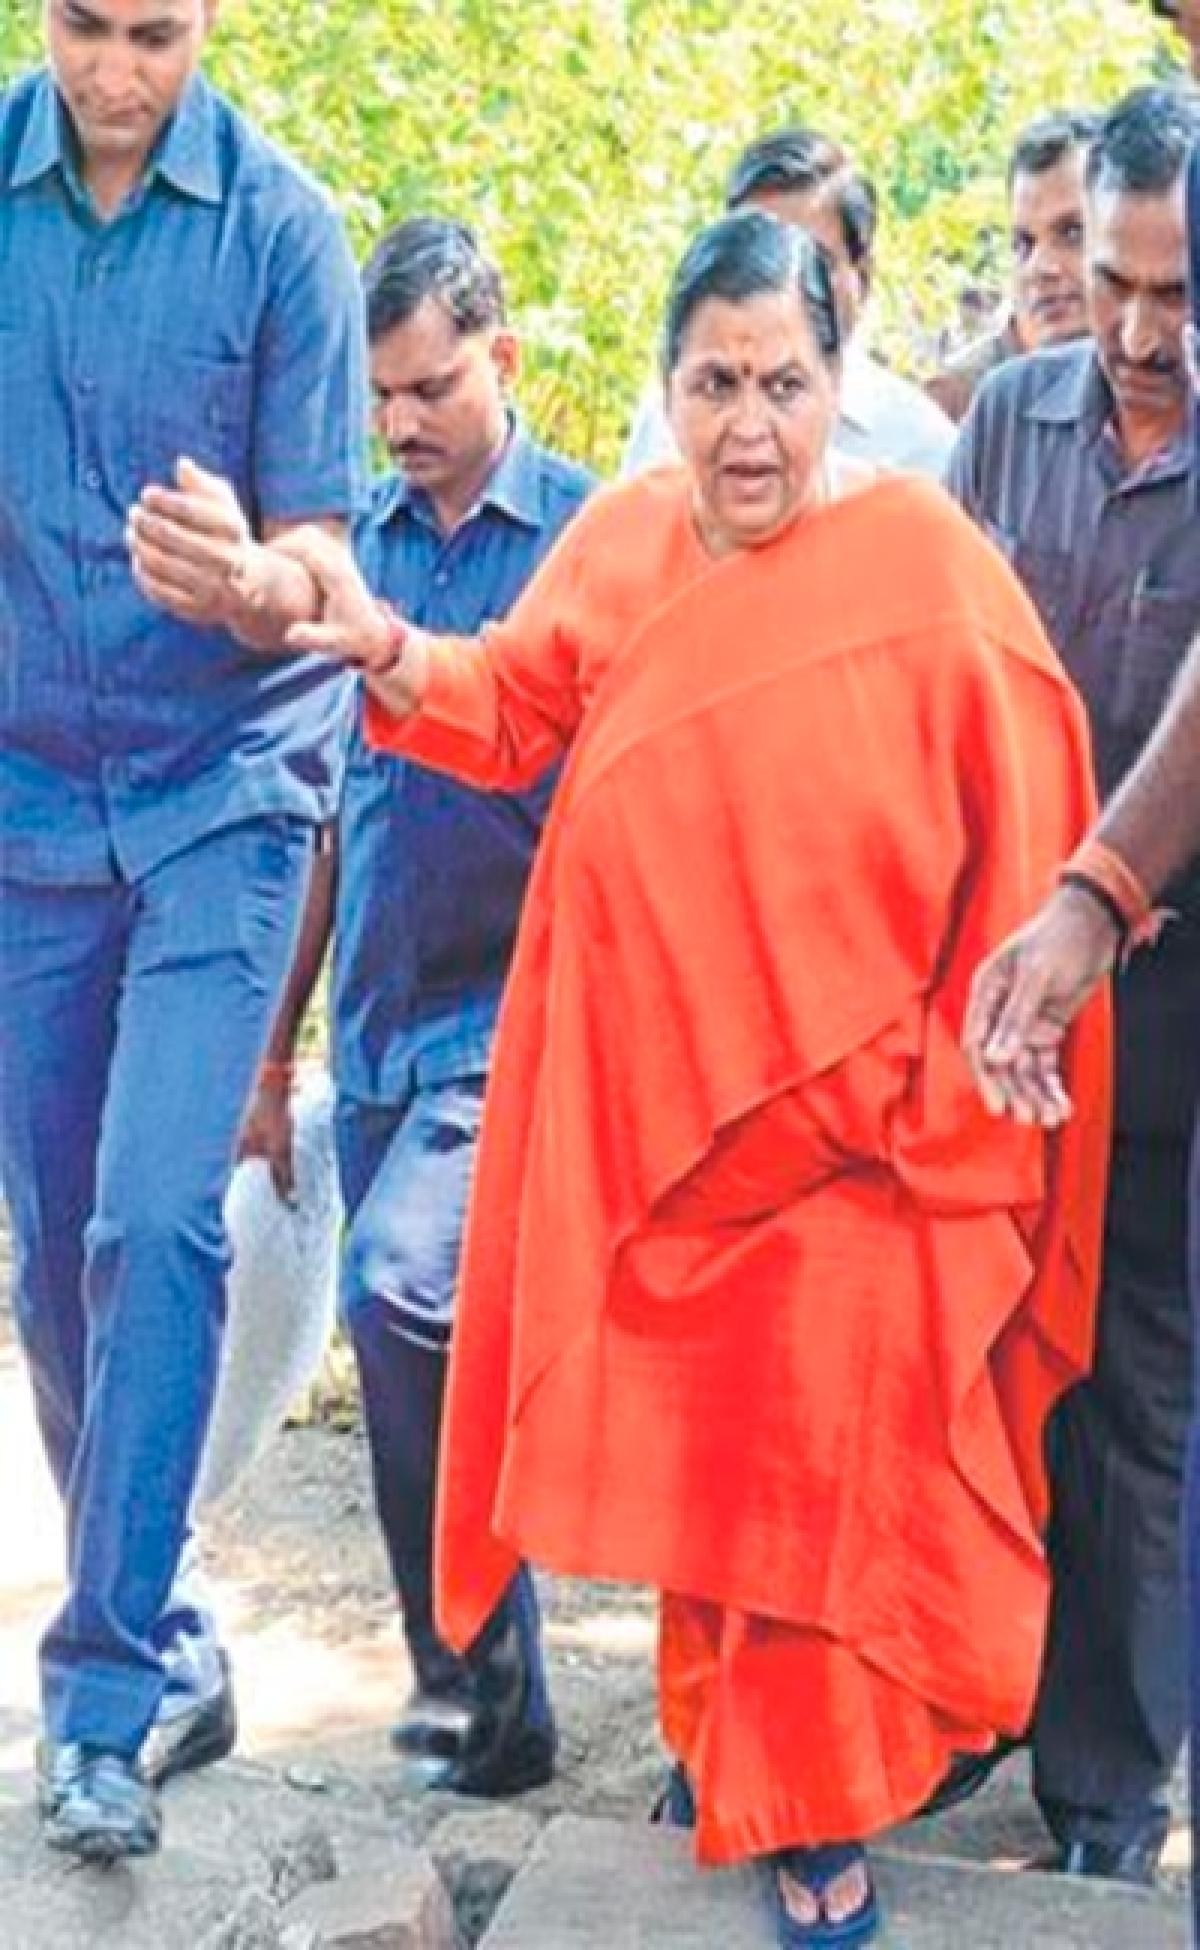 Bhopal: Hardik, Kanhaiya should not snipe at Modi to chase TRPs: Uma